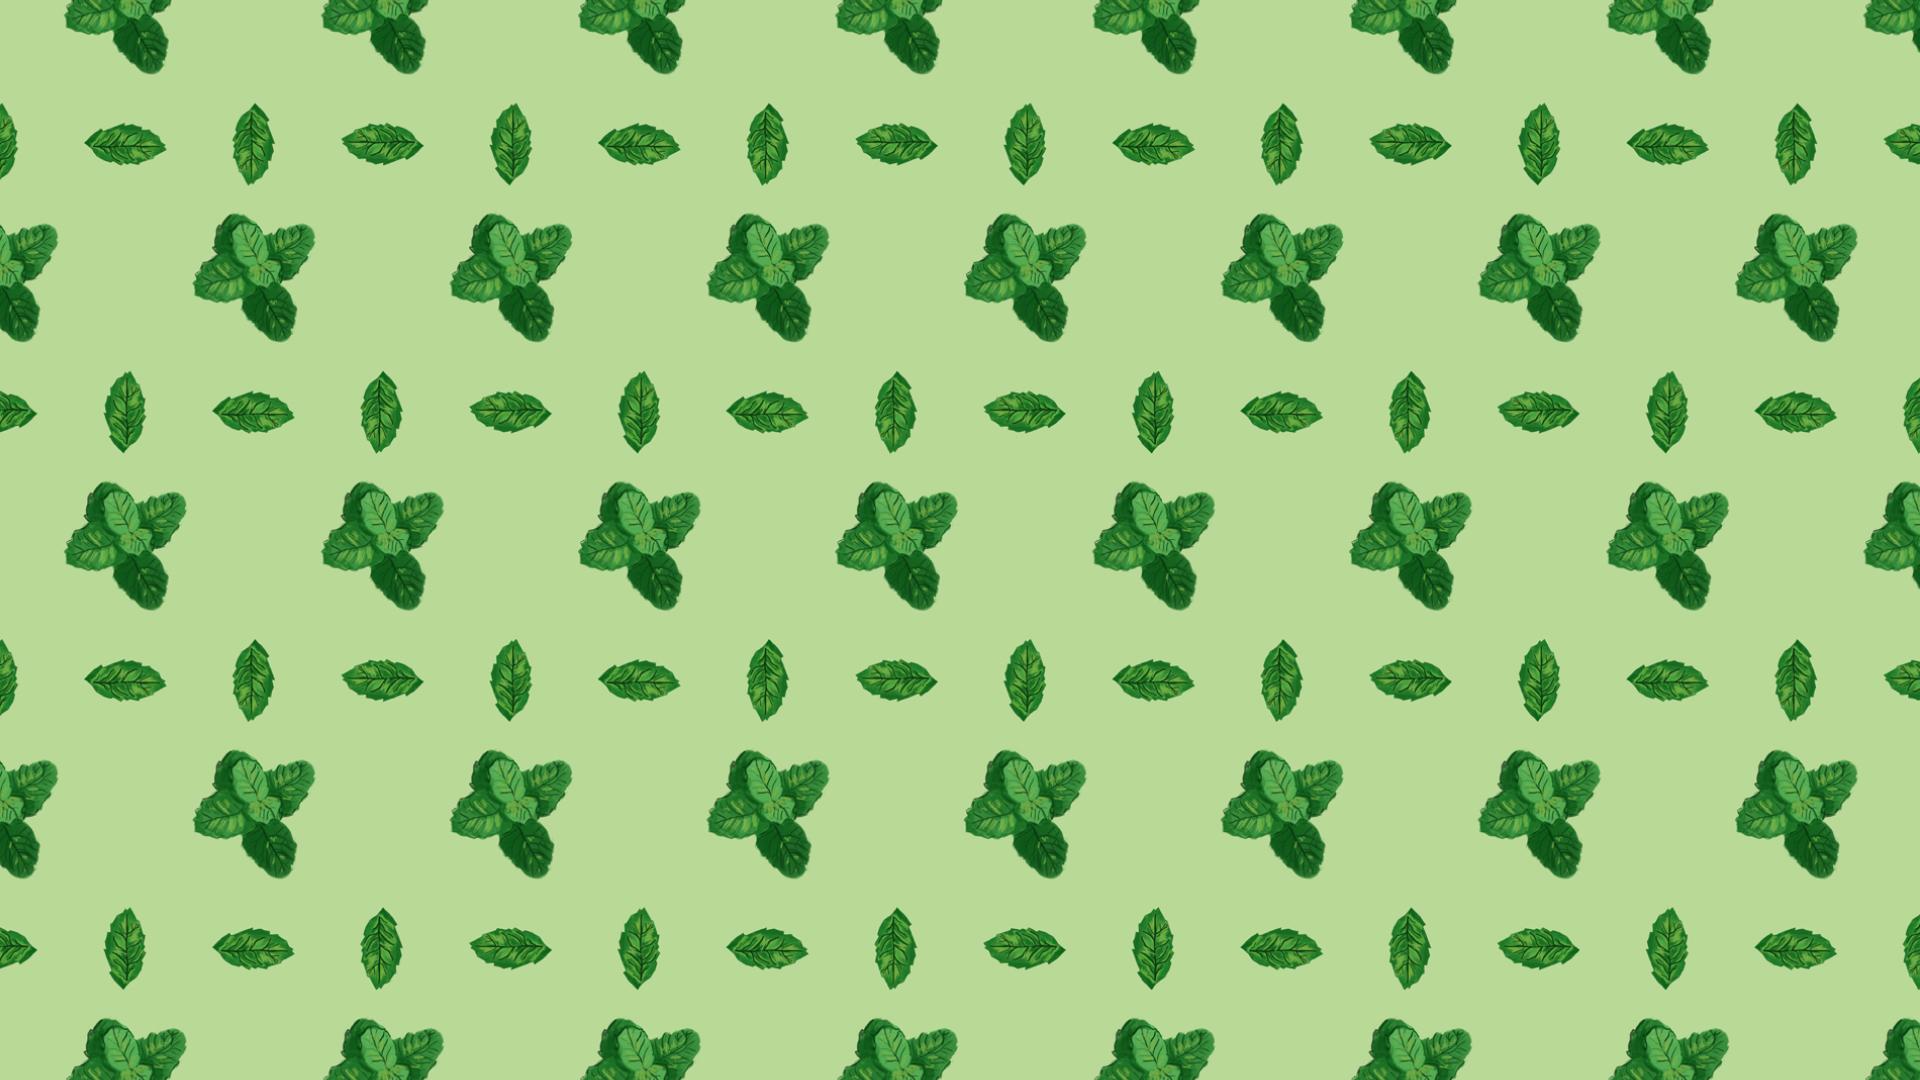 Wellness Brand Design - Mint illustrations pattern